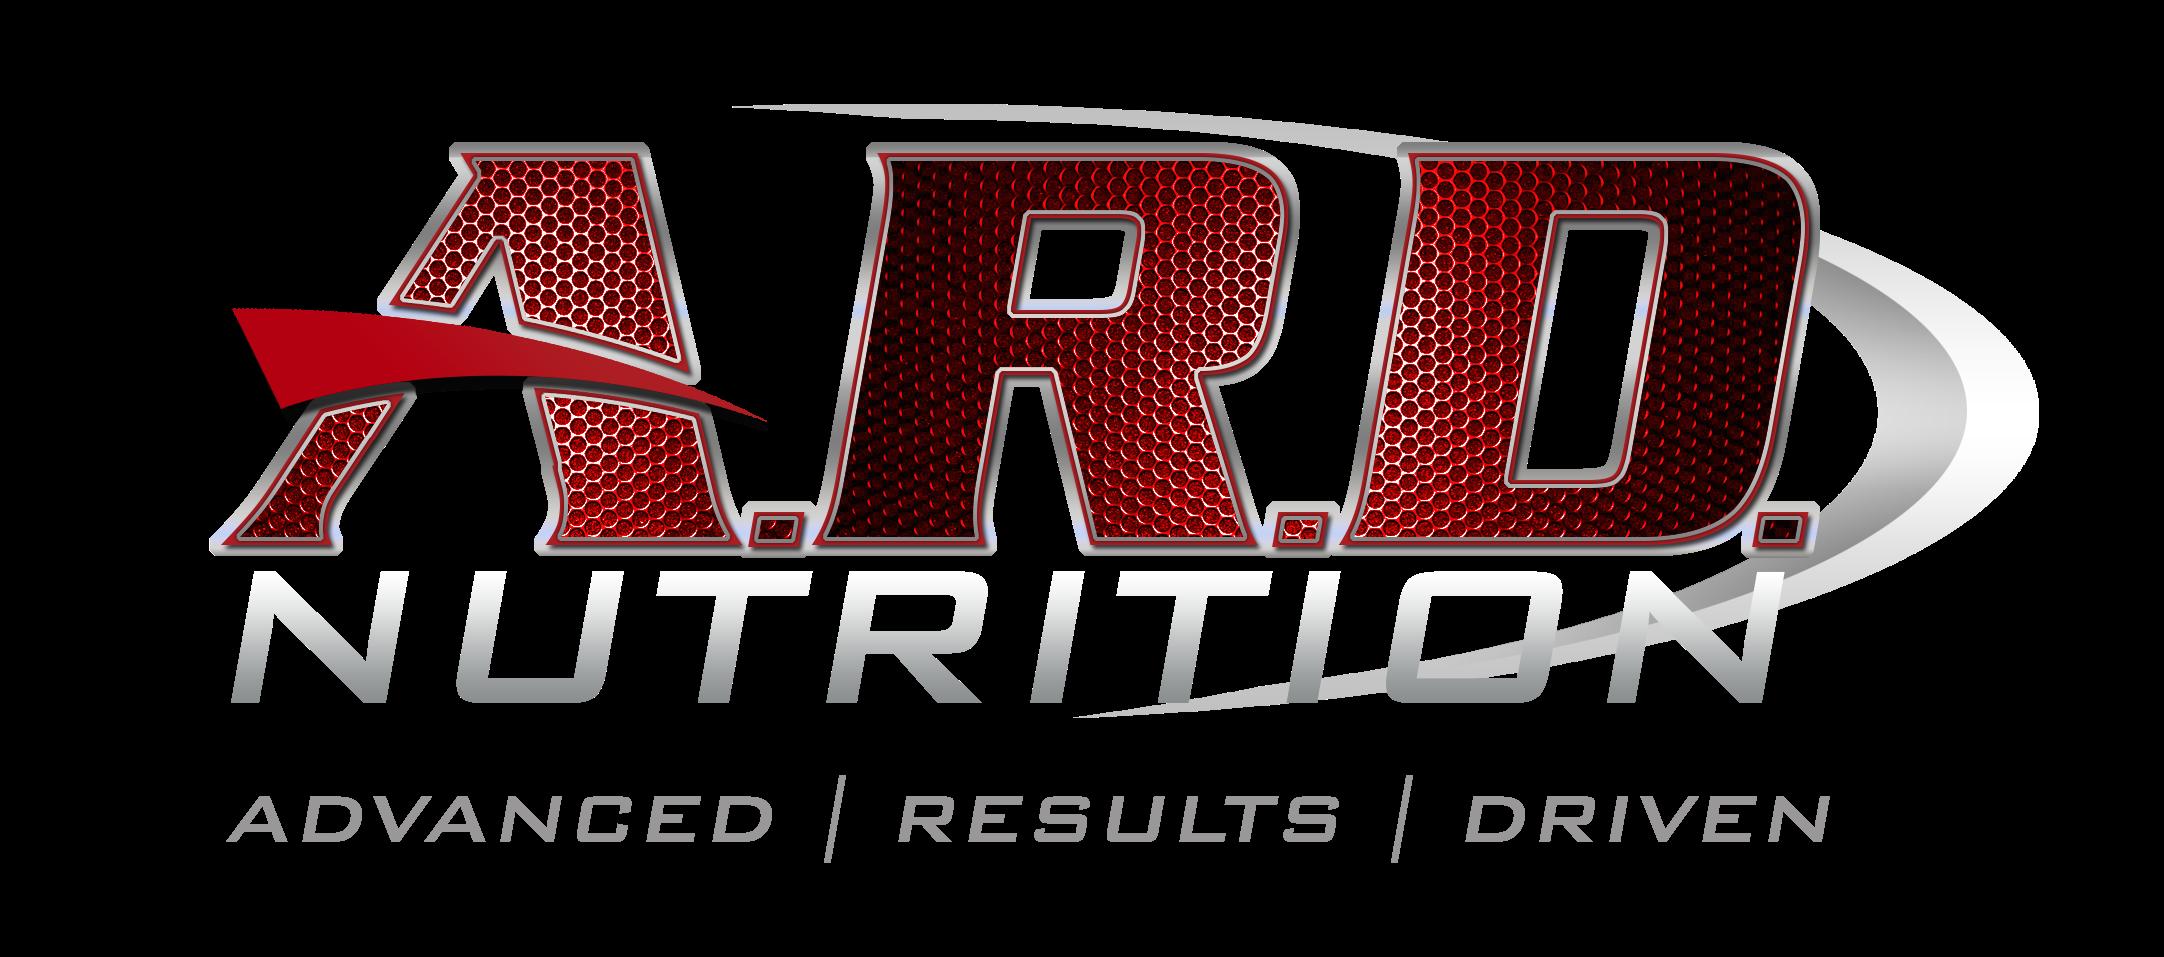 ARD Nutrition 2016 Title Sponsor of INBF Hercules & WNBF Pro Masters.png